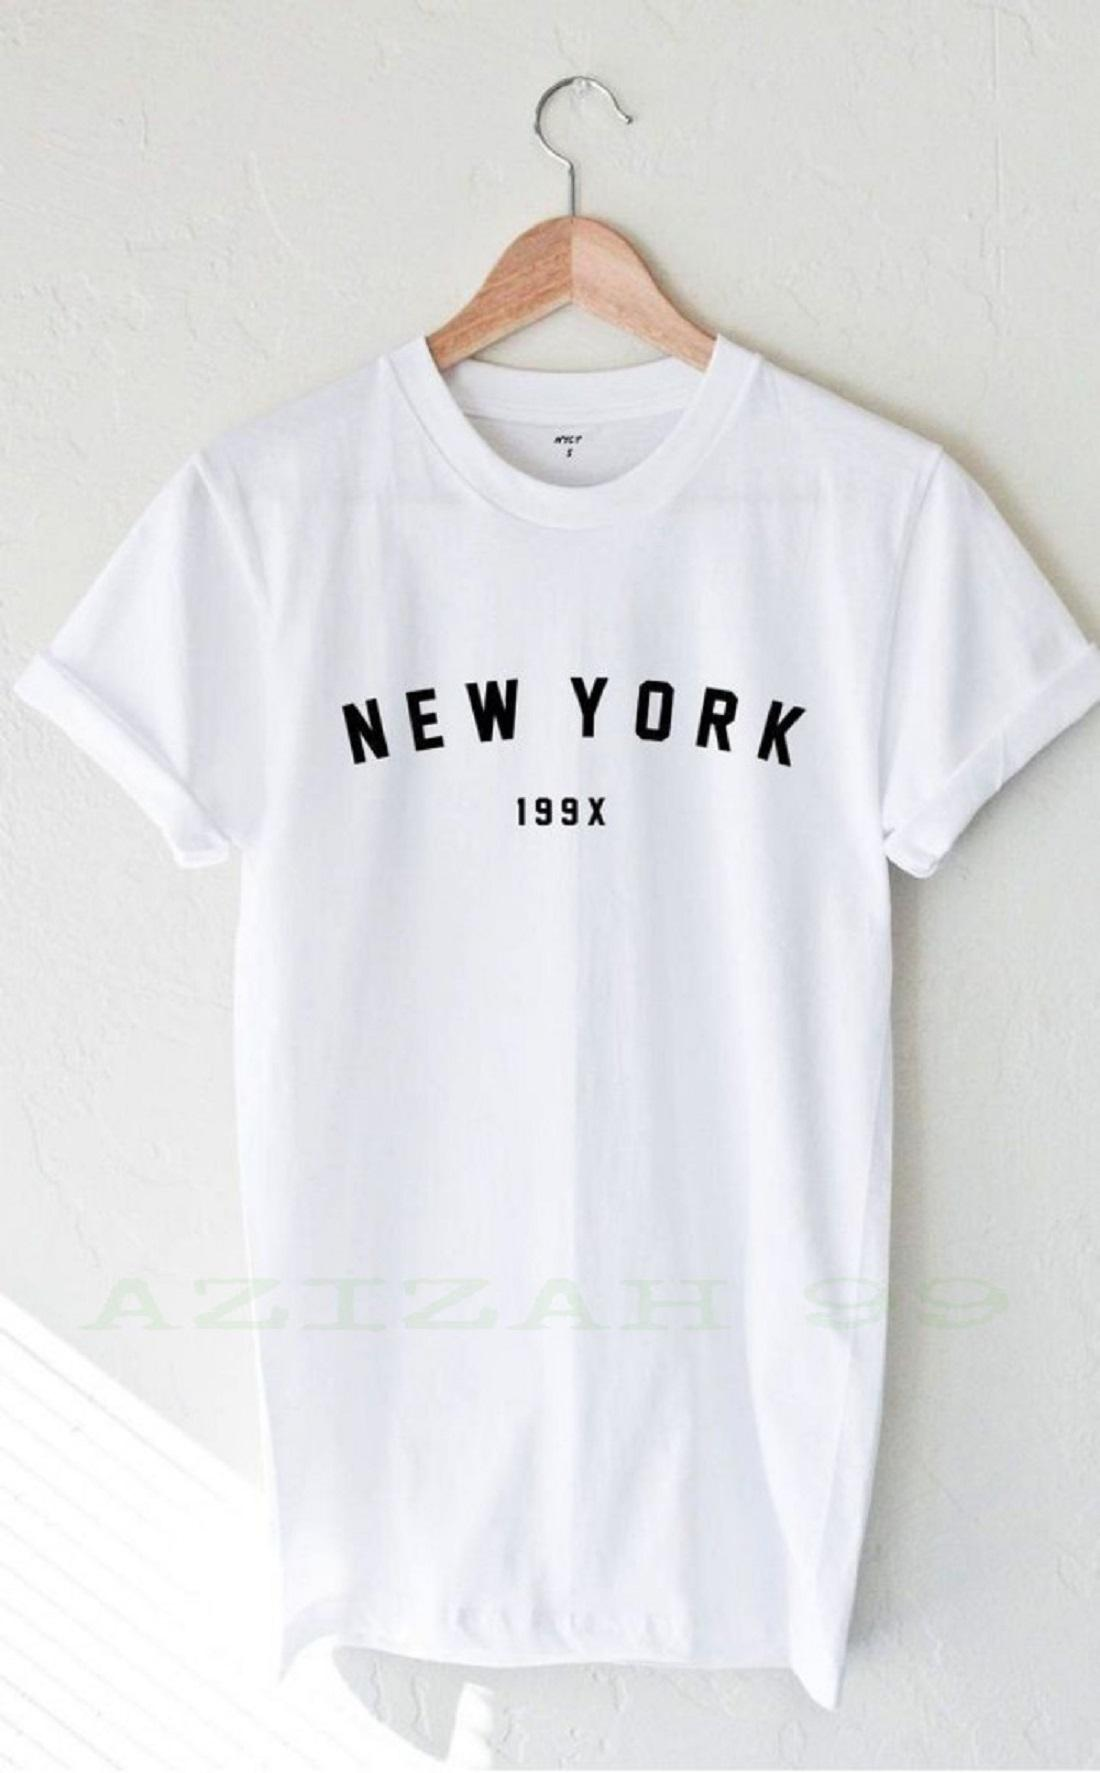 AZ99 Kaos Pria Distro Keren Terbaru Murah NY Korea Printing 3D Bergambar unisex Buatan Bandung Logo T-Shirt Pria 100% Cotton Combed 30s Atasan Pria Ukuran S M L XL XXL